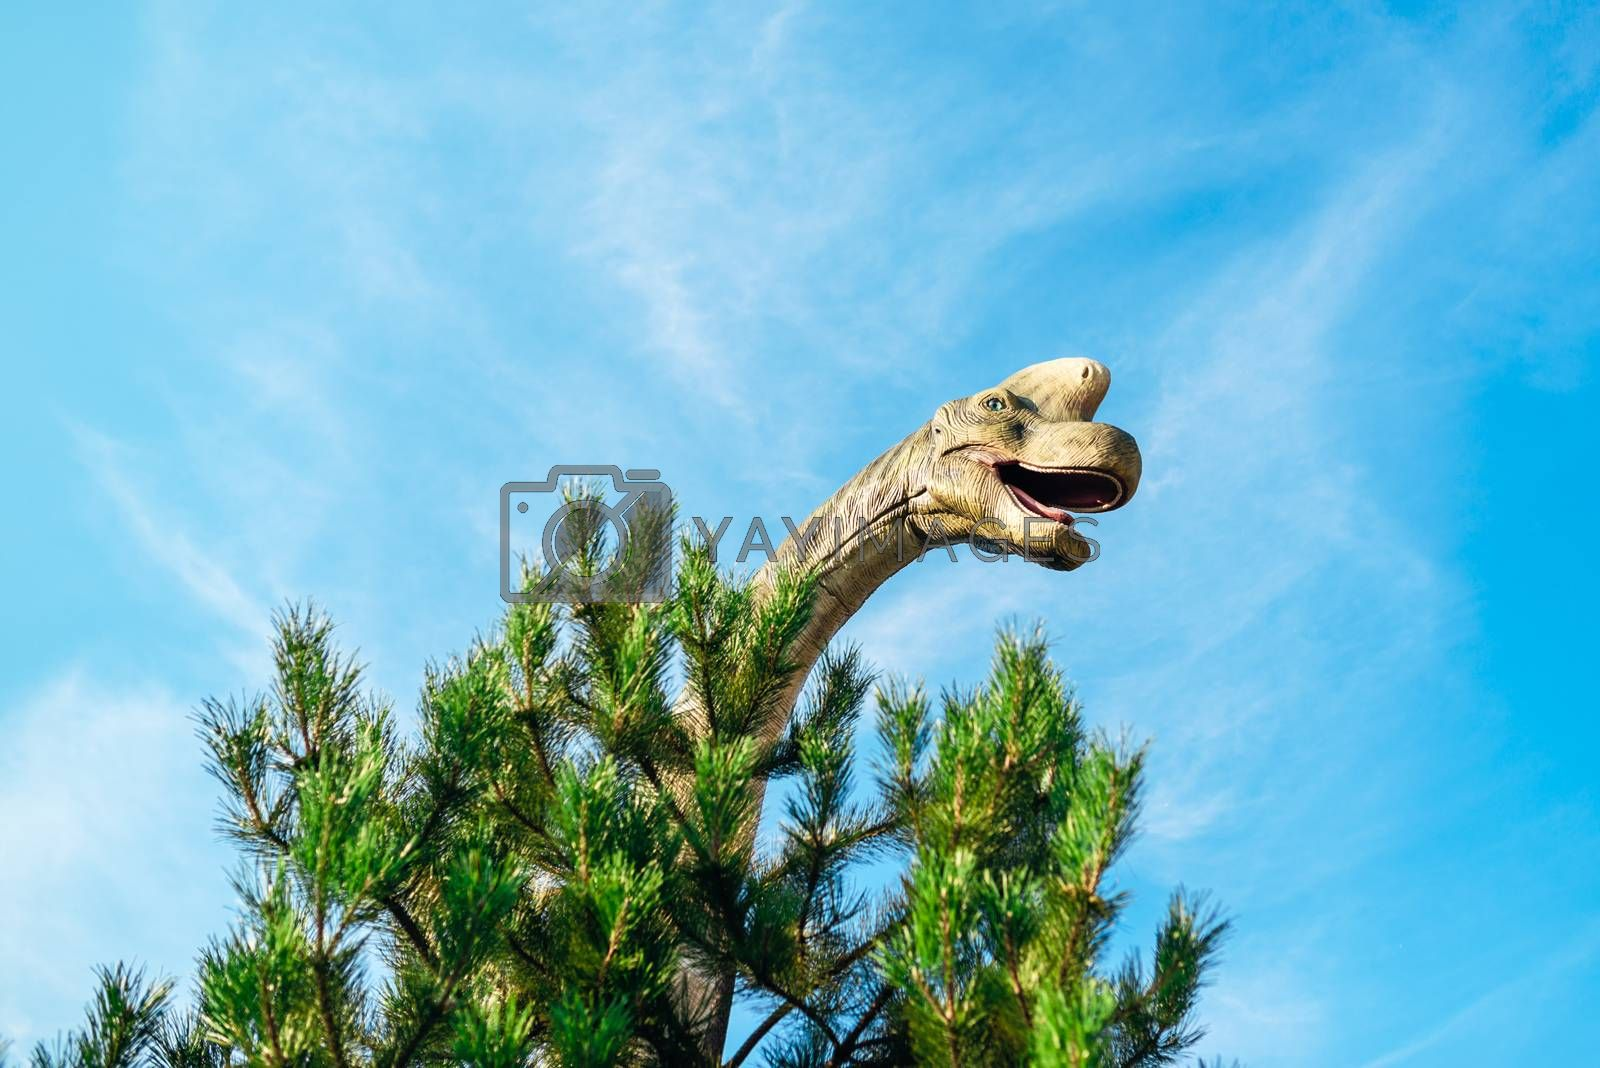 NOVI SAD, SERBIA - AUGUST 7, 2016: Brachiosaurus life size model of prehistoric animal in theme entertainment Dino Park. This was the largest known dinosaur, estimated at 26 metres.